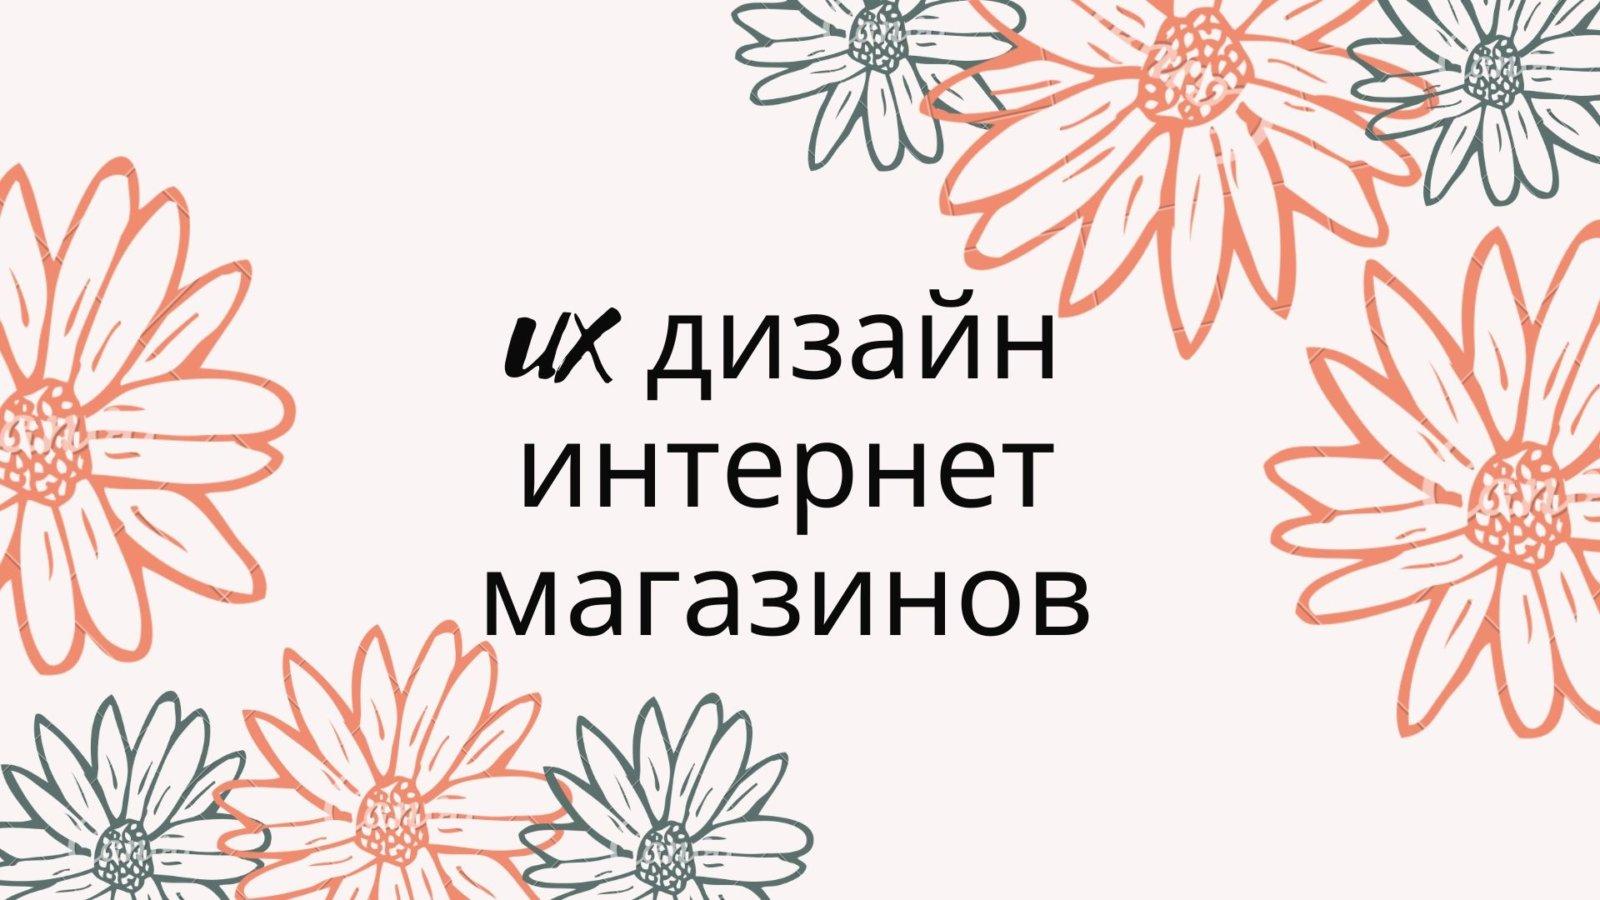 UX design for online stores